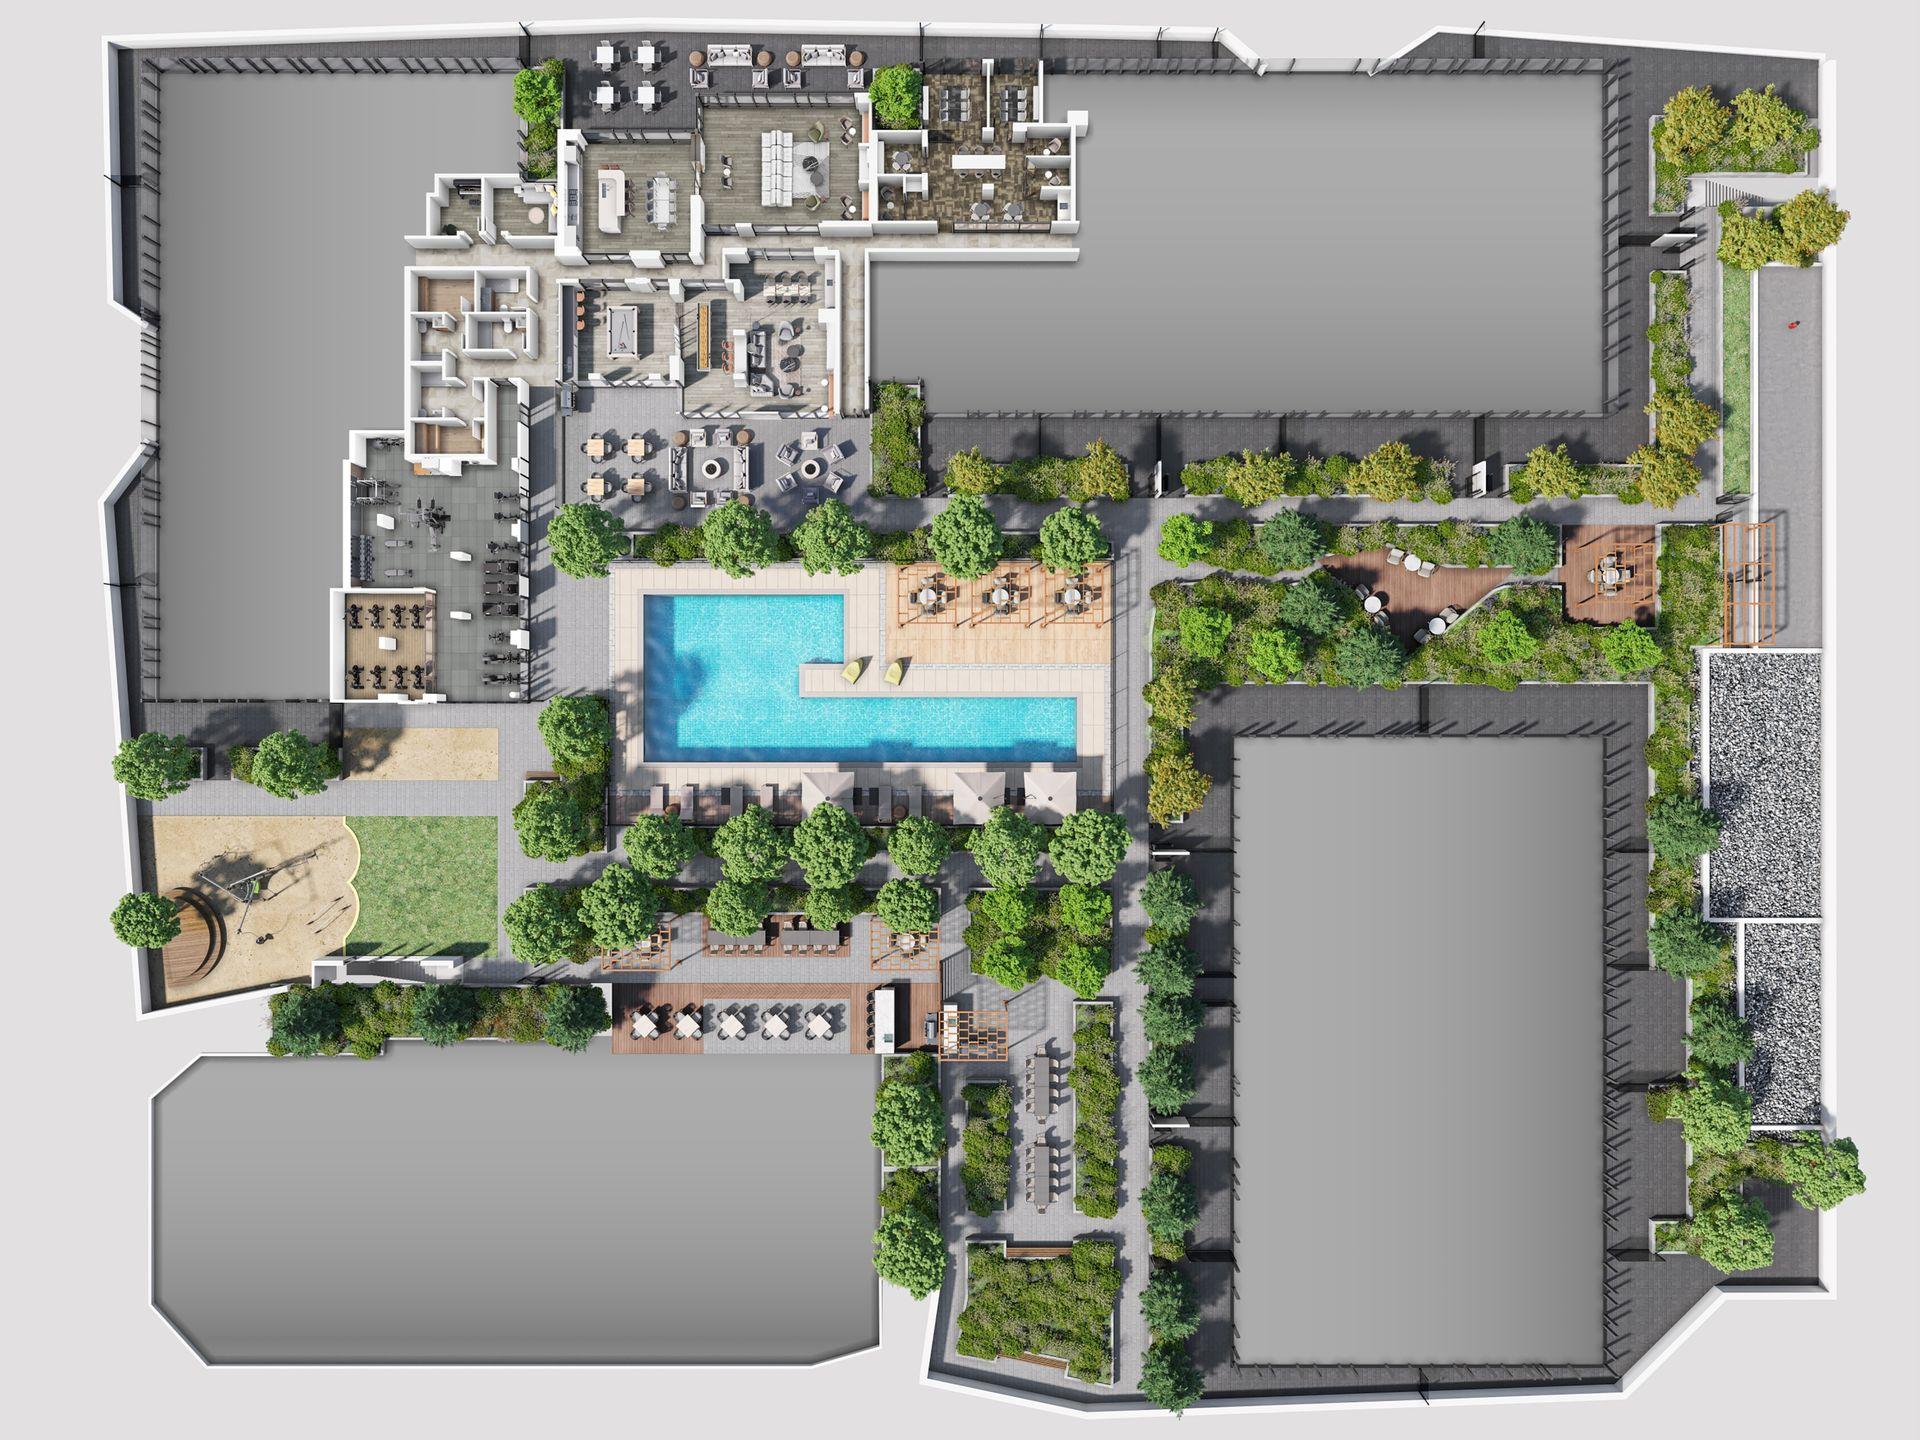 luxe-amenity-site-plan at Luxe Lansdowne ( Lansdowne Rd @ No.3 Road, Richmond)